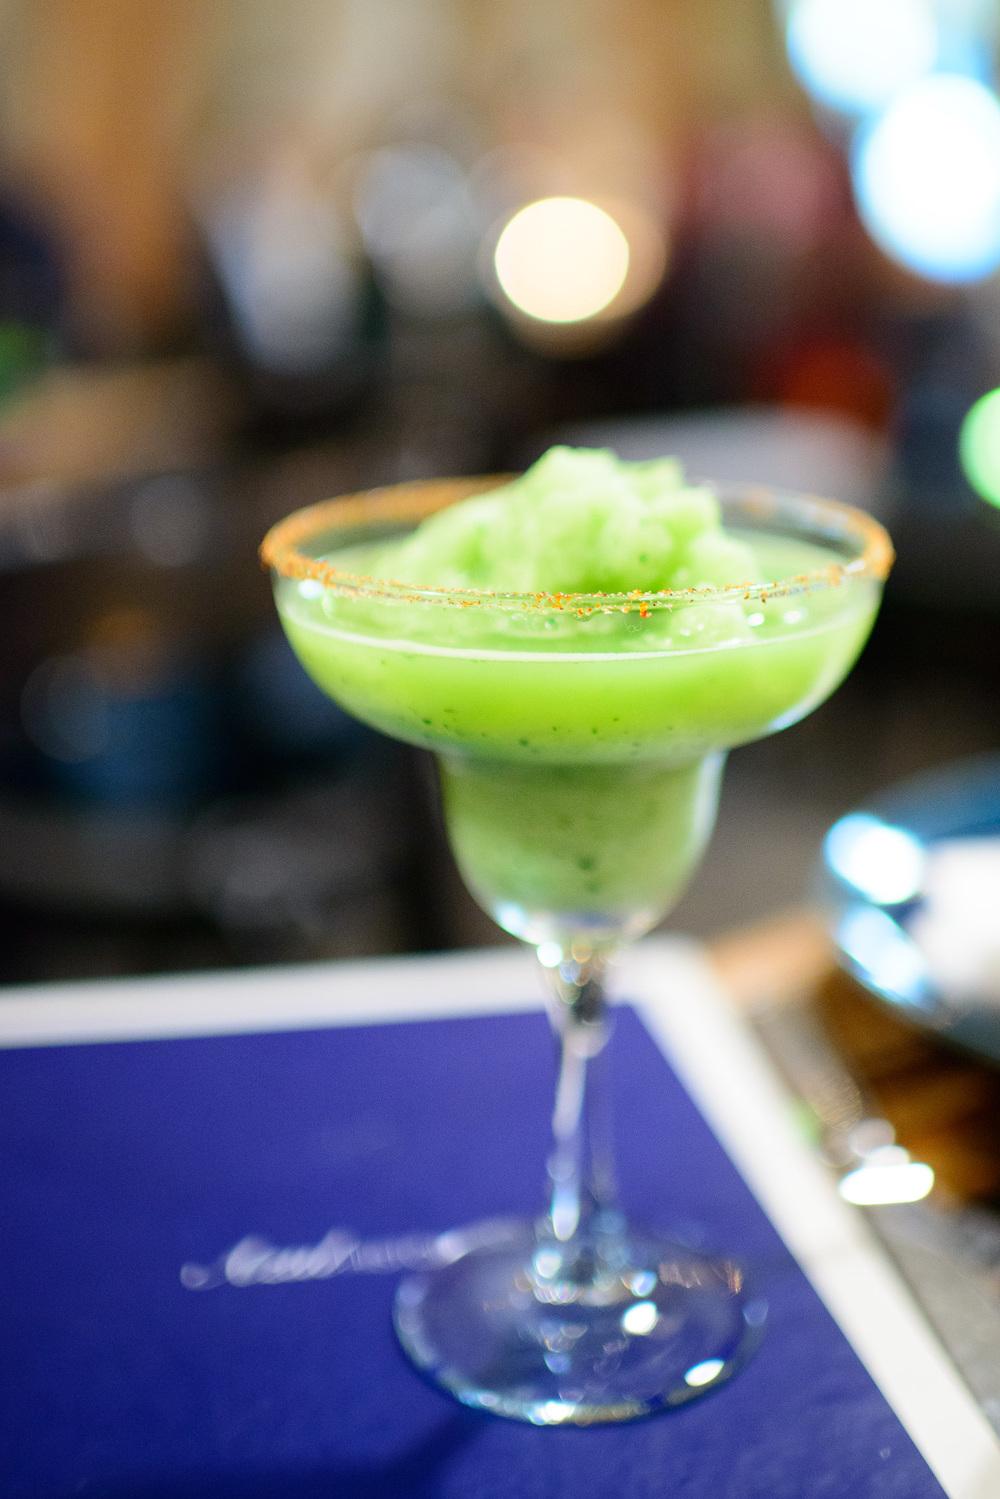 Margarita de pepino con mezcal (Cucumber margarita with mezcal)